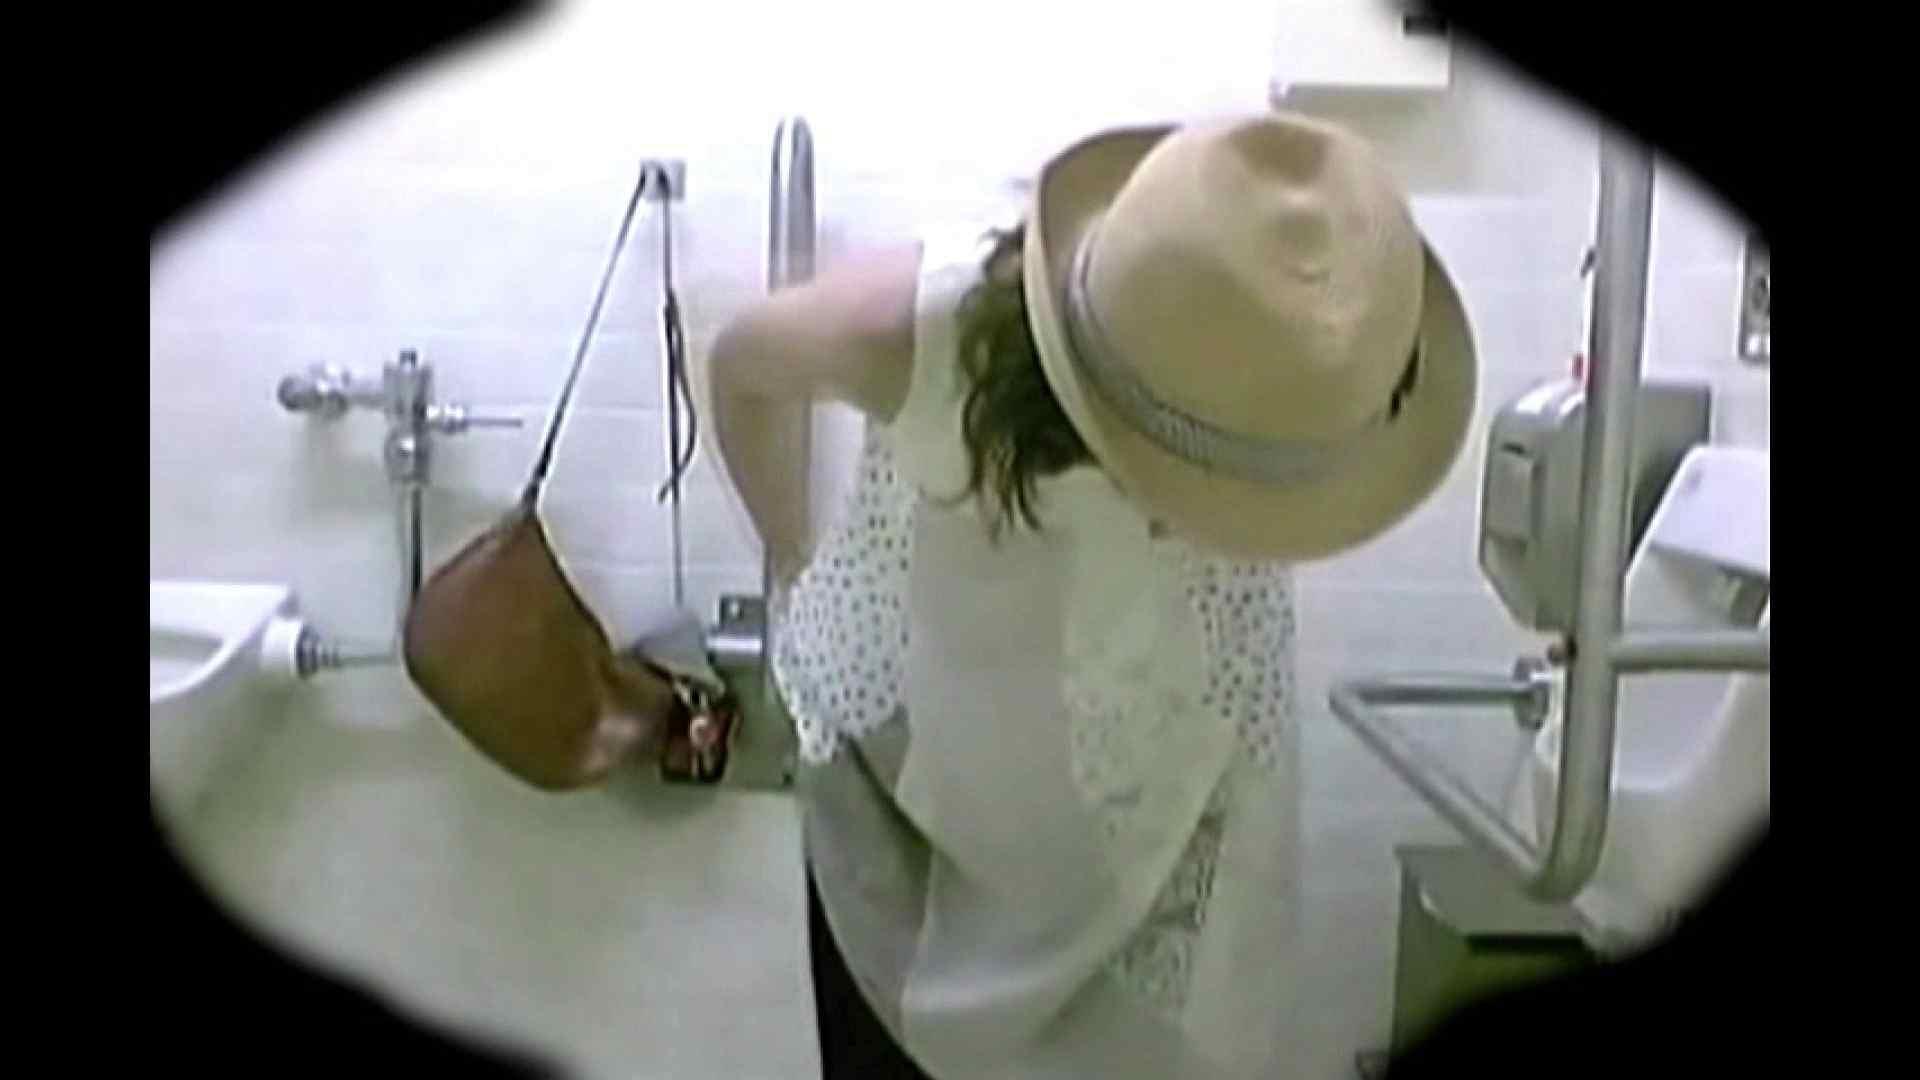 teen galトイレ覗き紙がナイ編‼vol.06 覗き スケベ動画紹介 82連発 66